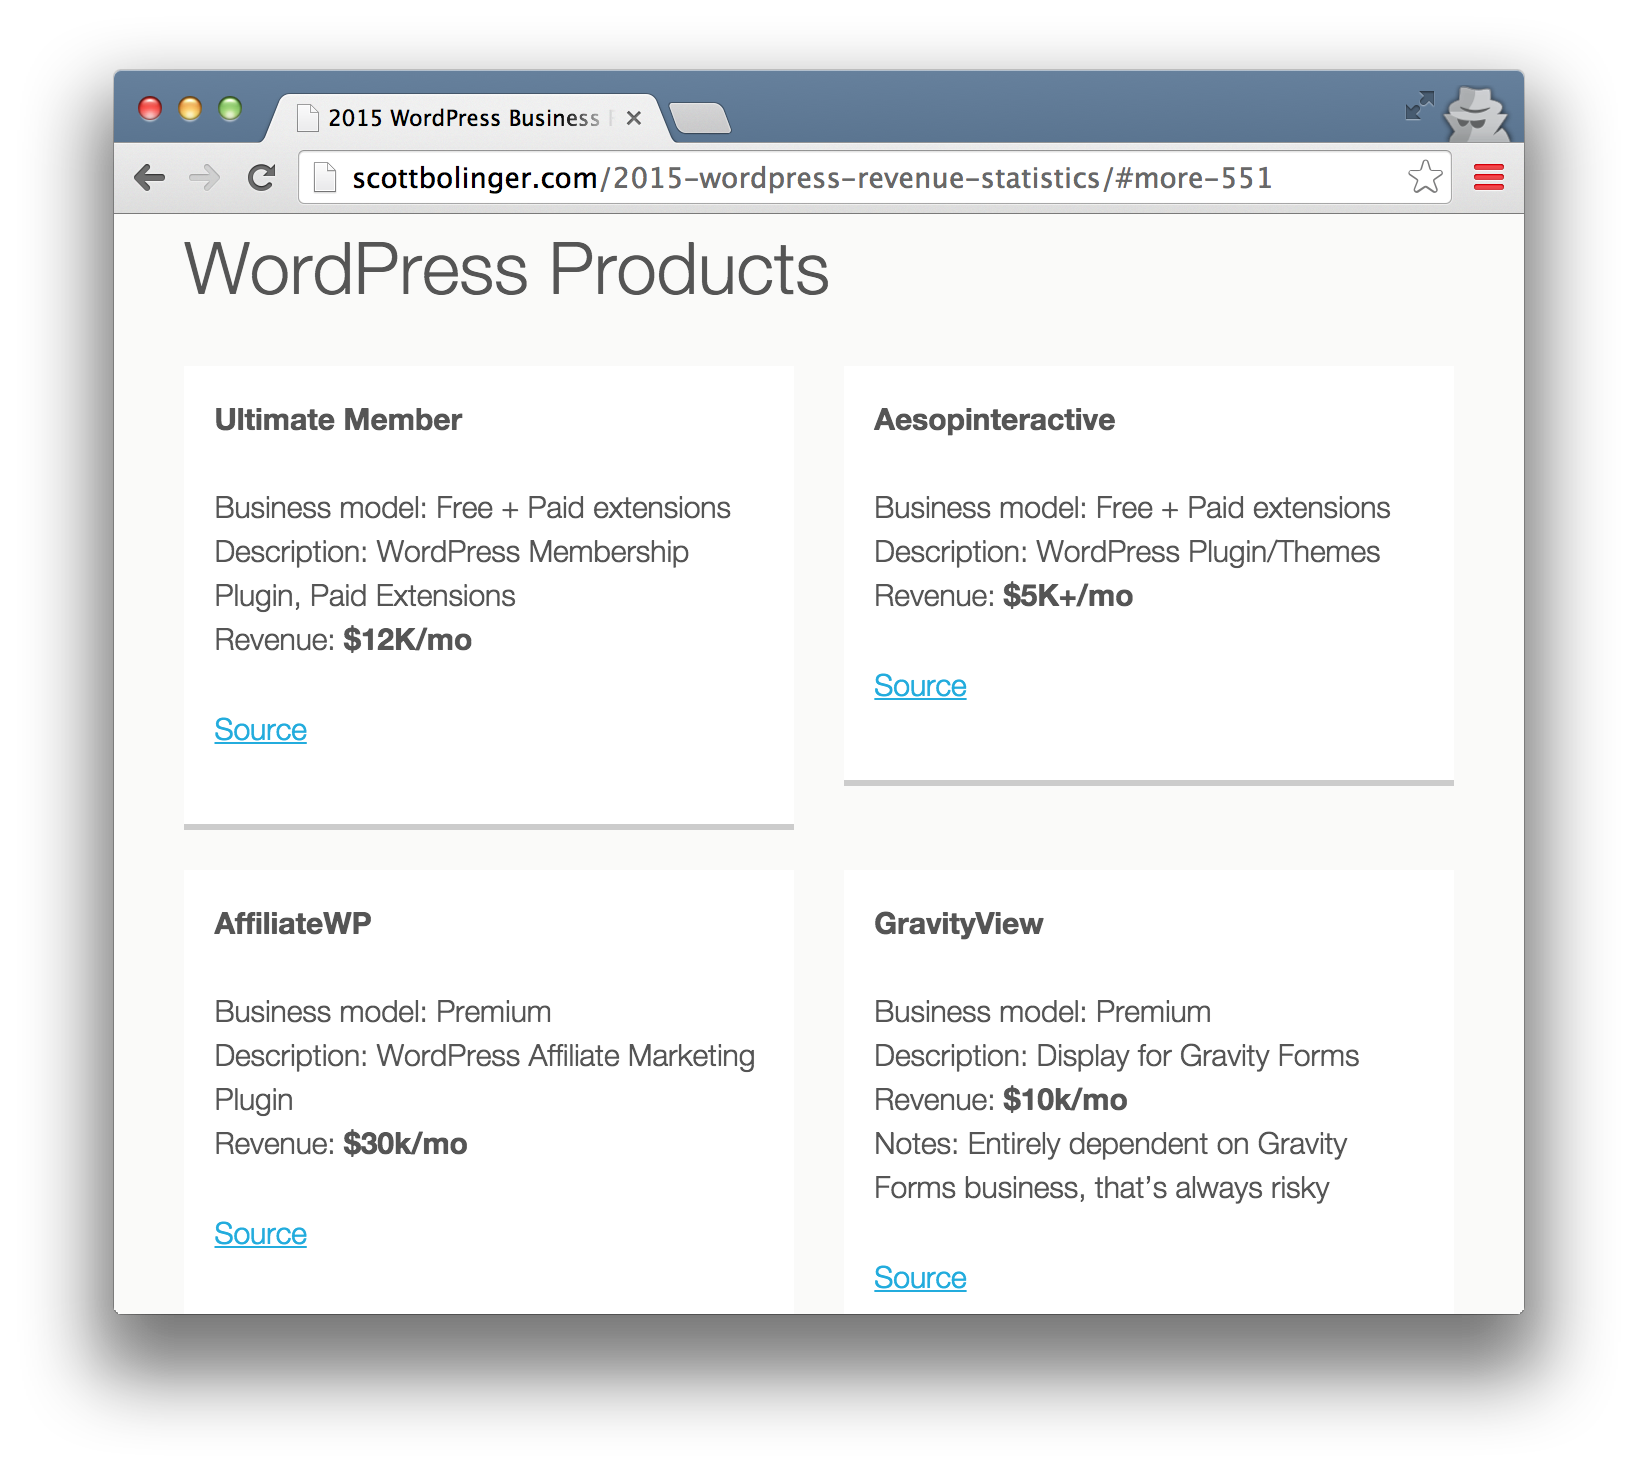 wordpress-business-revenue